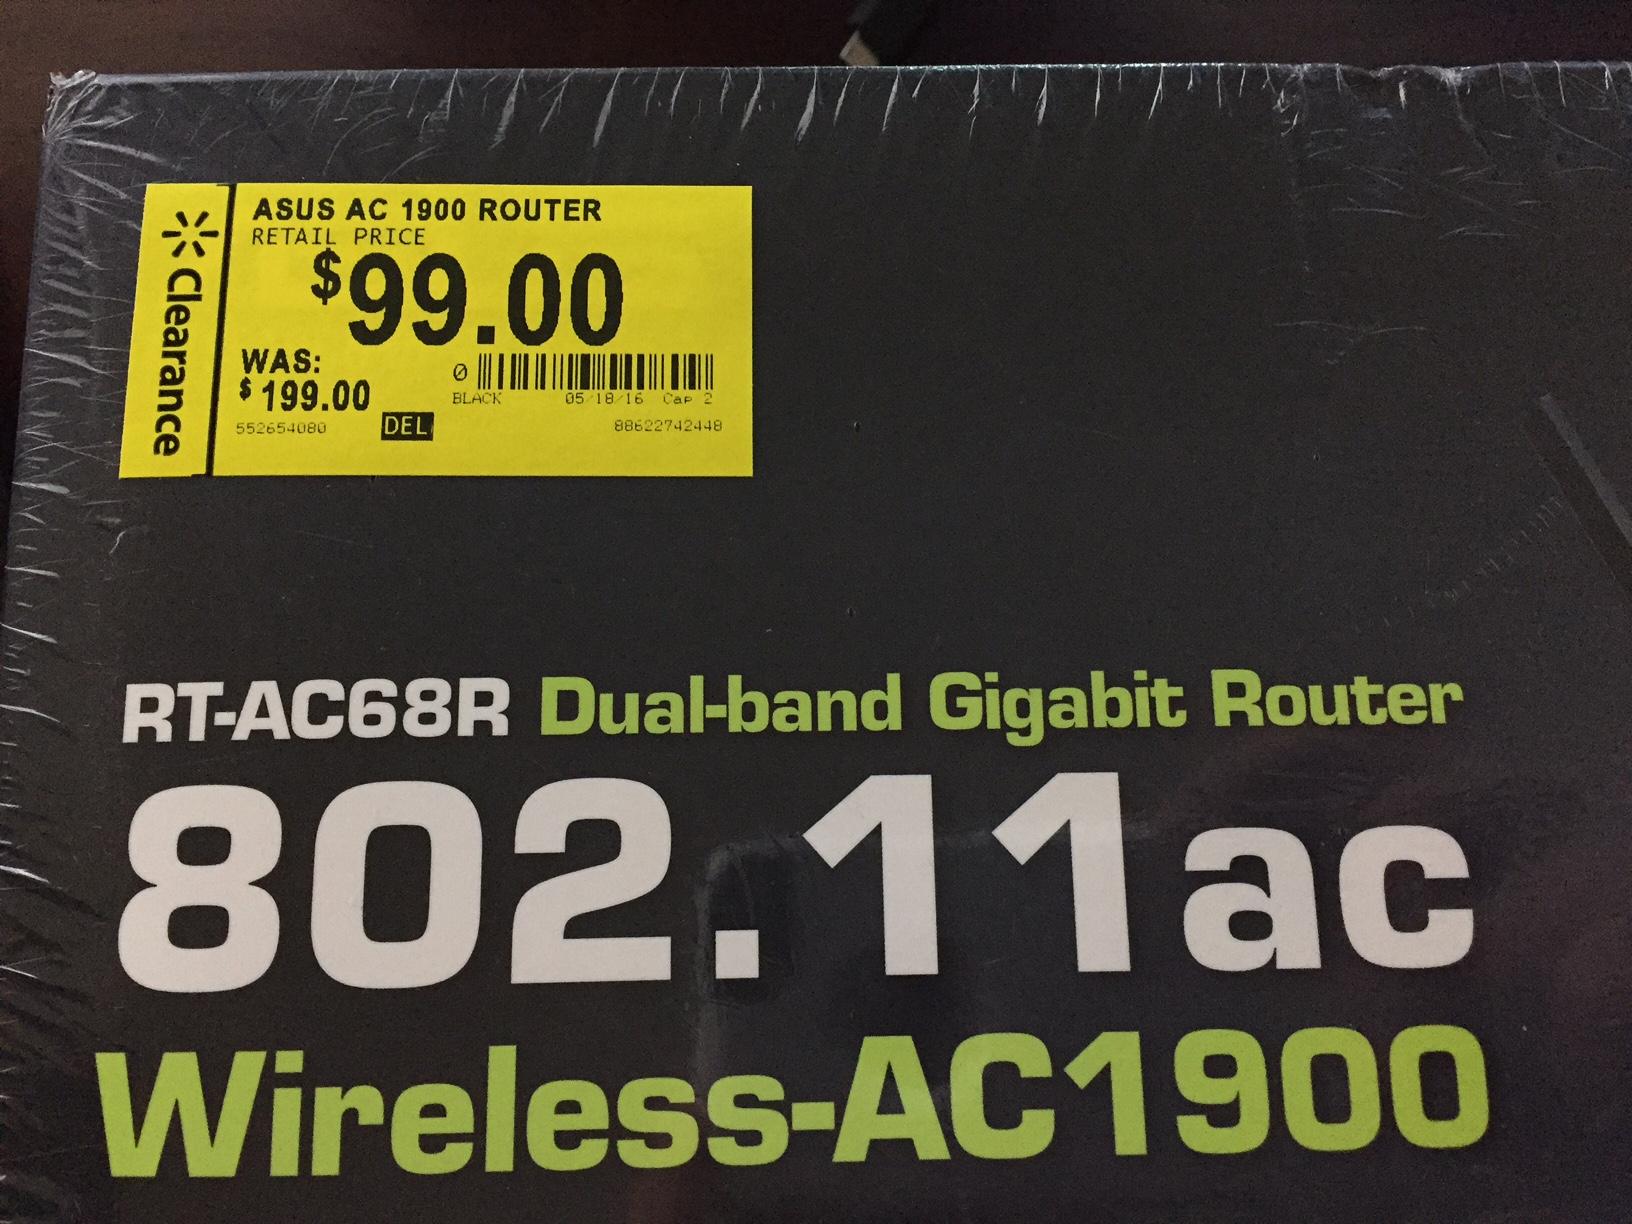 ASUS RT-AC68R Dual-Band Wireless-AC1900 Gigabit Router $99 Walmart B&M YMMV